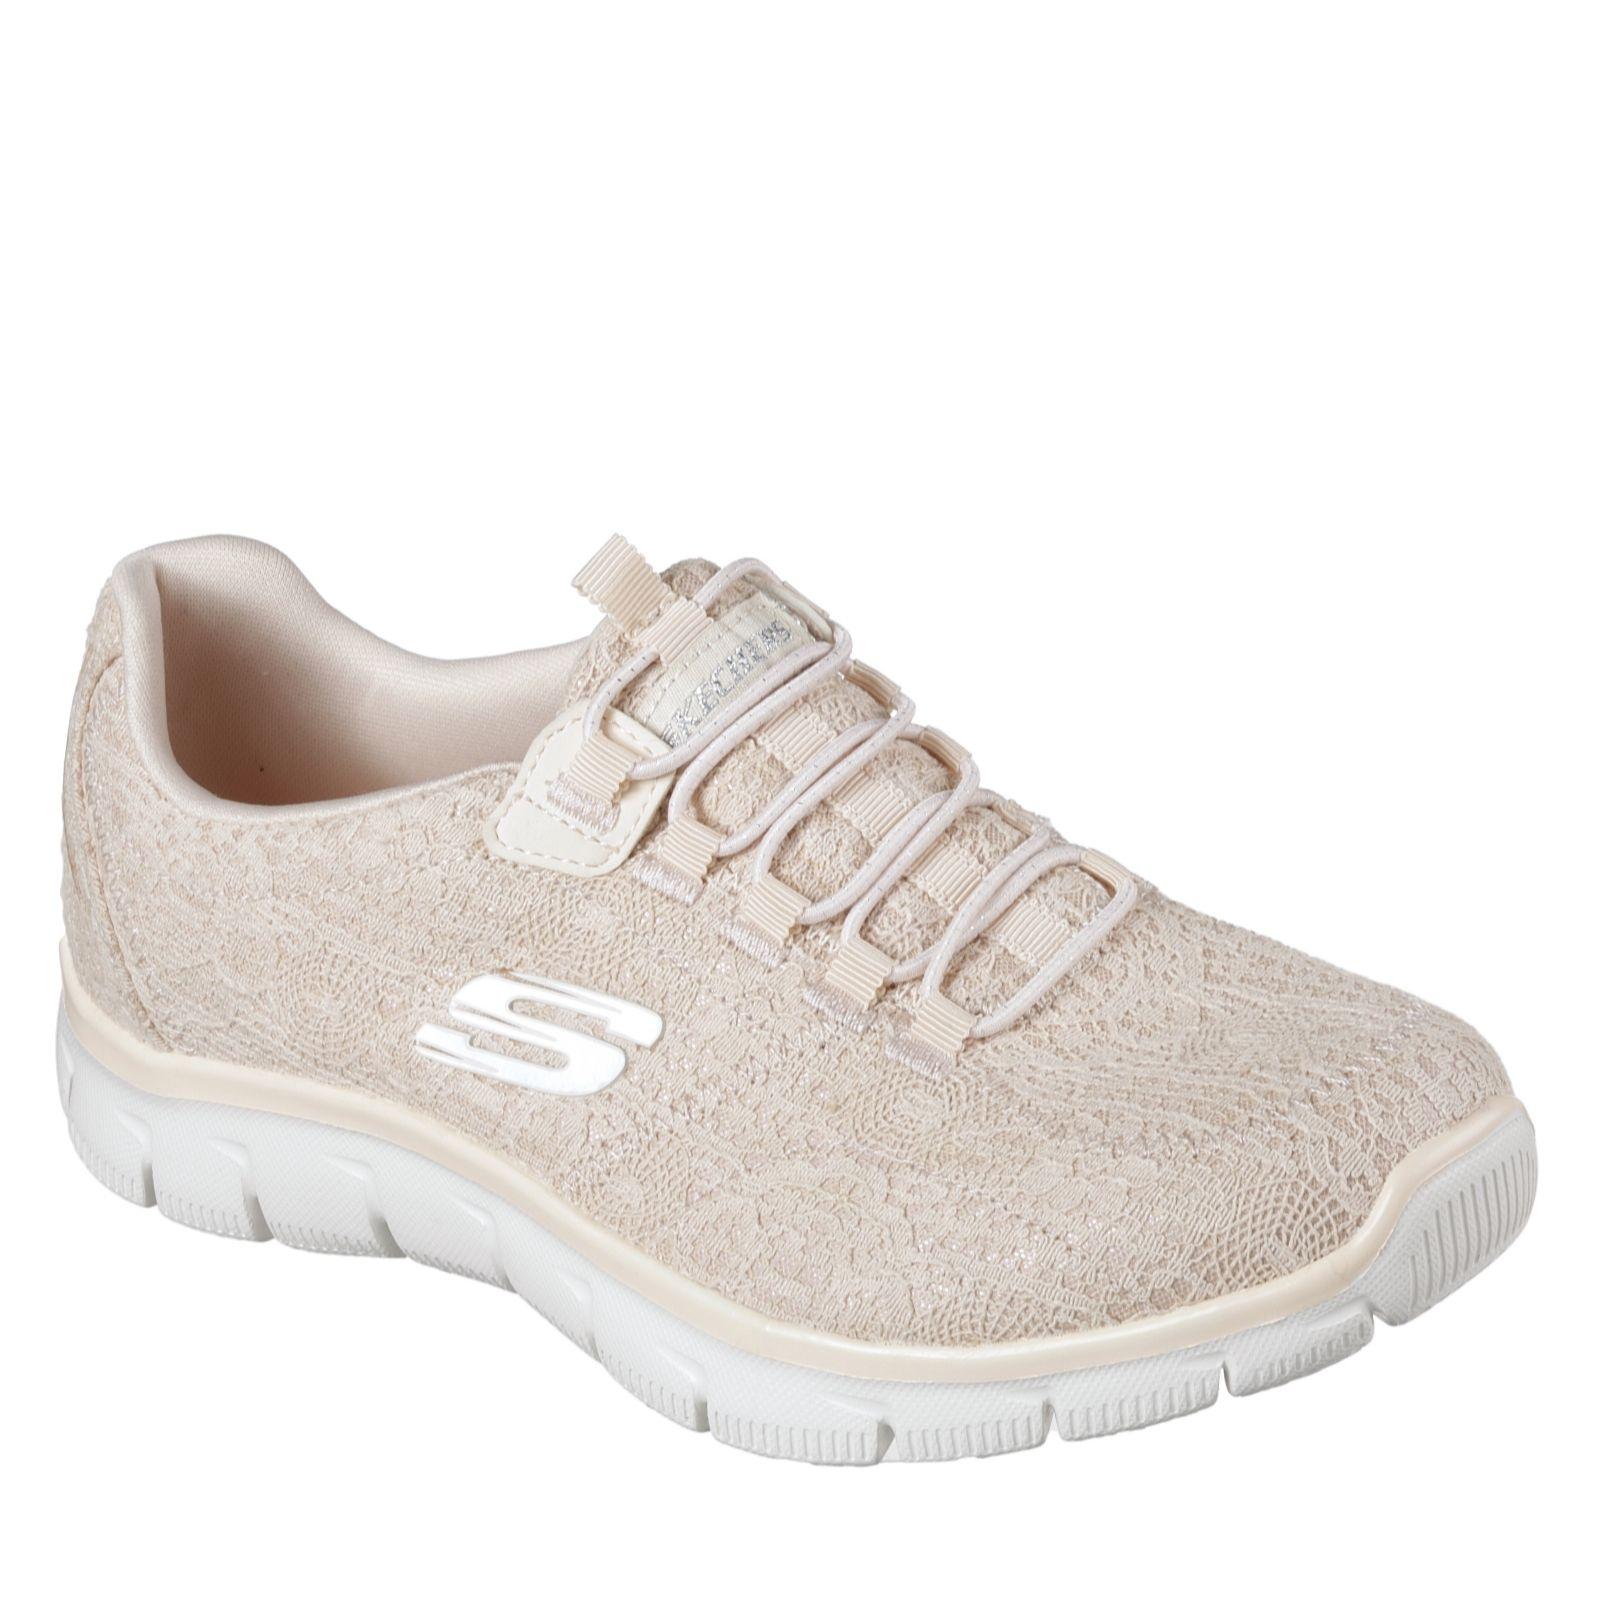 6fa83f8fd8c8 Skechers Womens Ladies Empire Spring Glow Memory Foam Sneakers Shoes